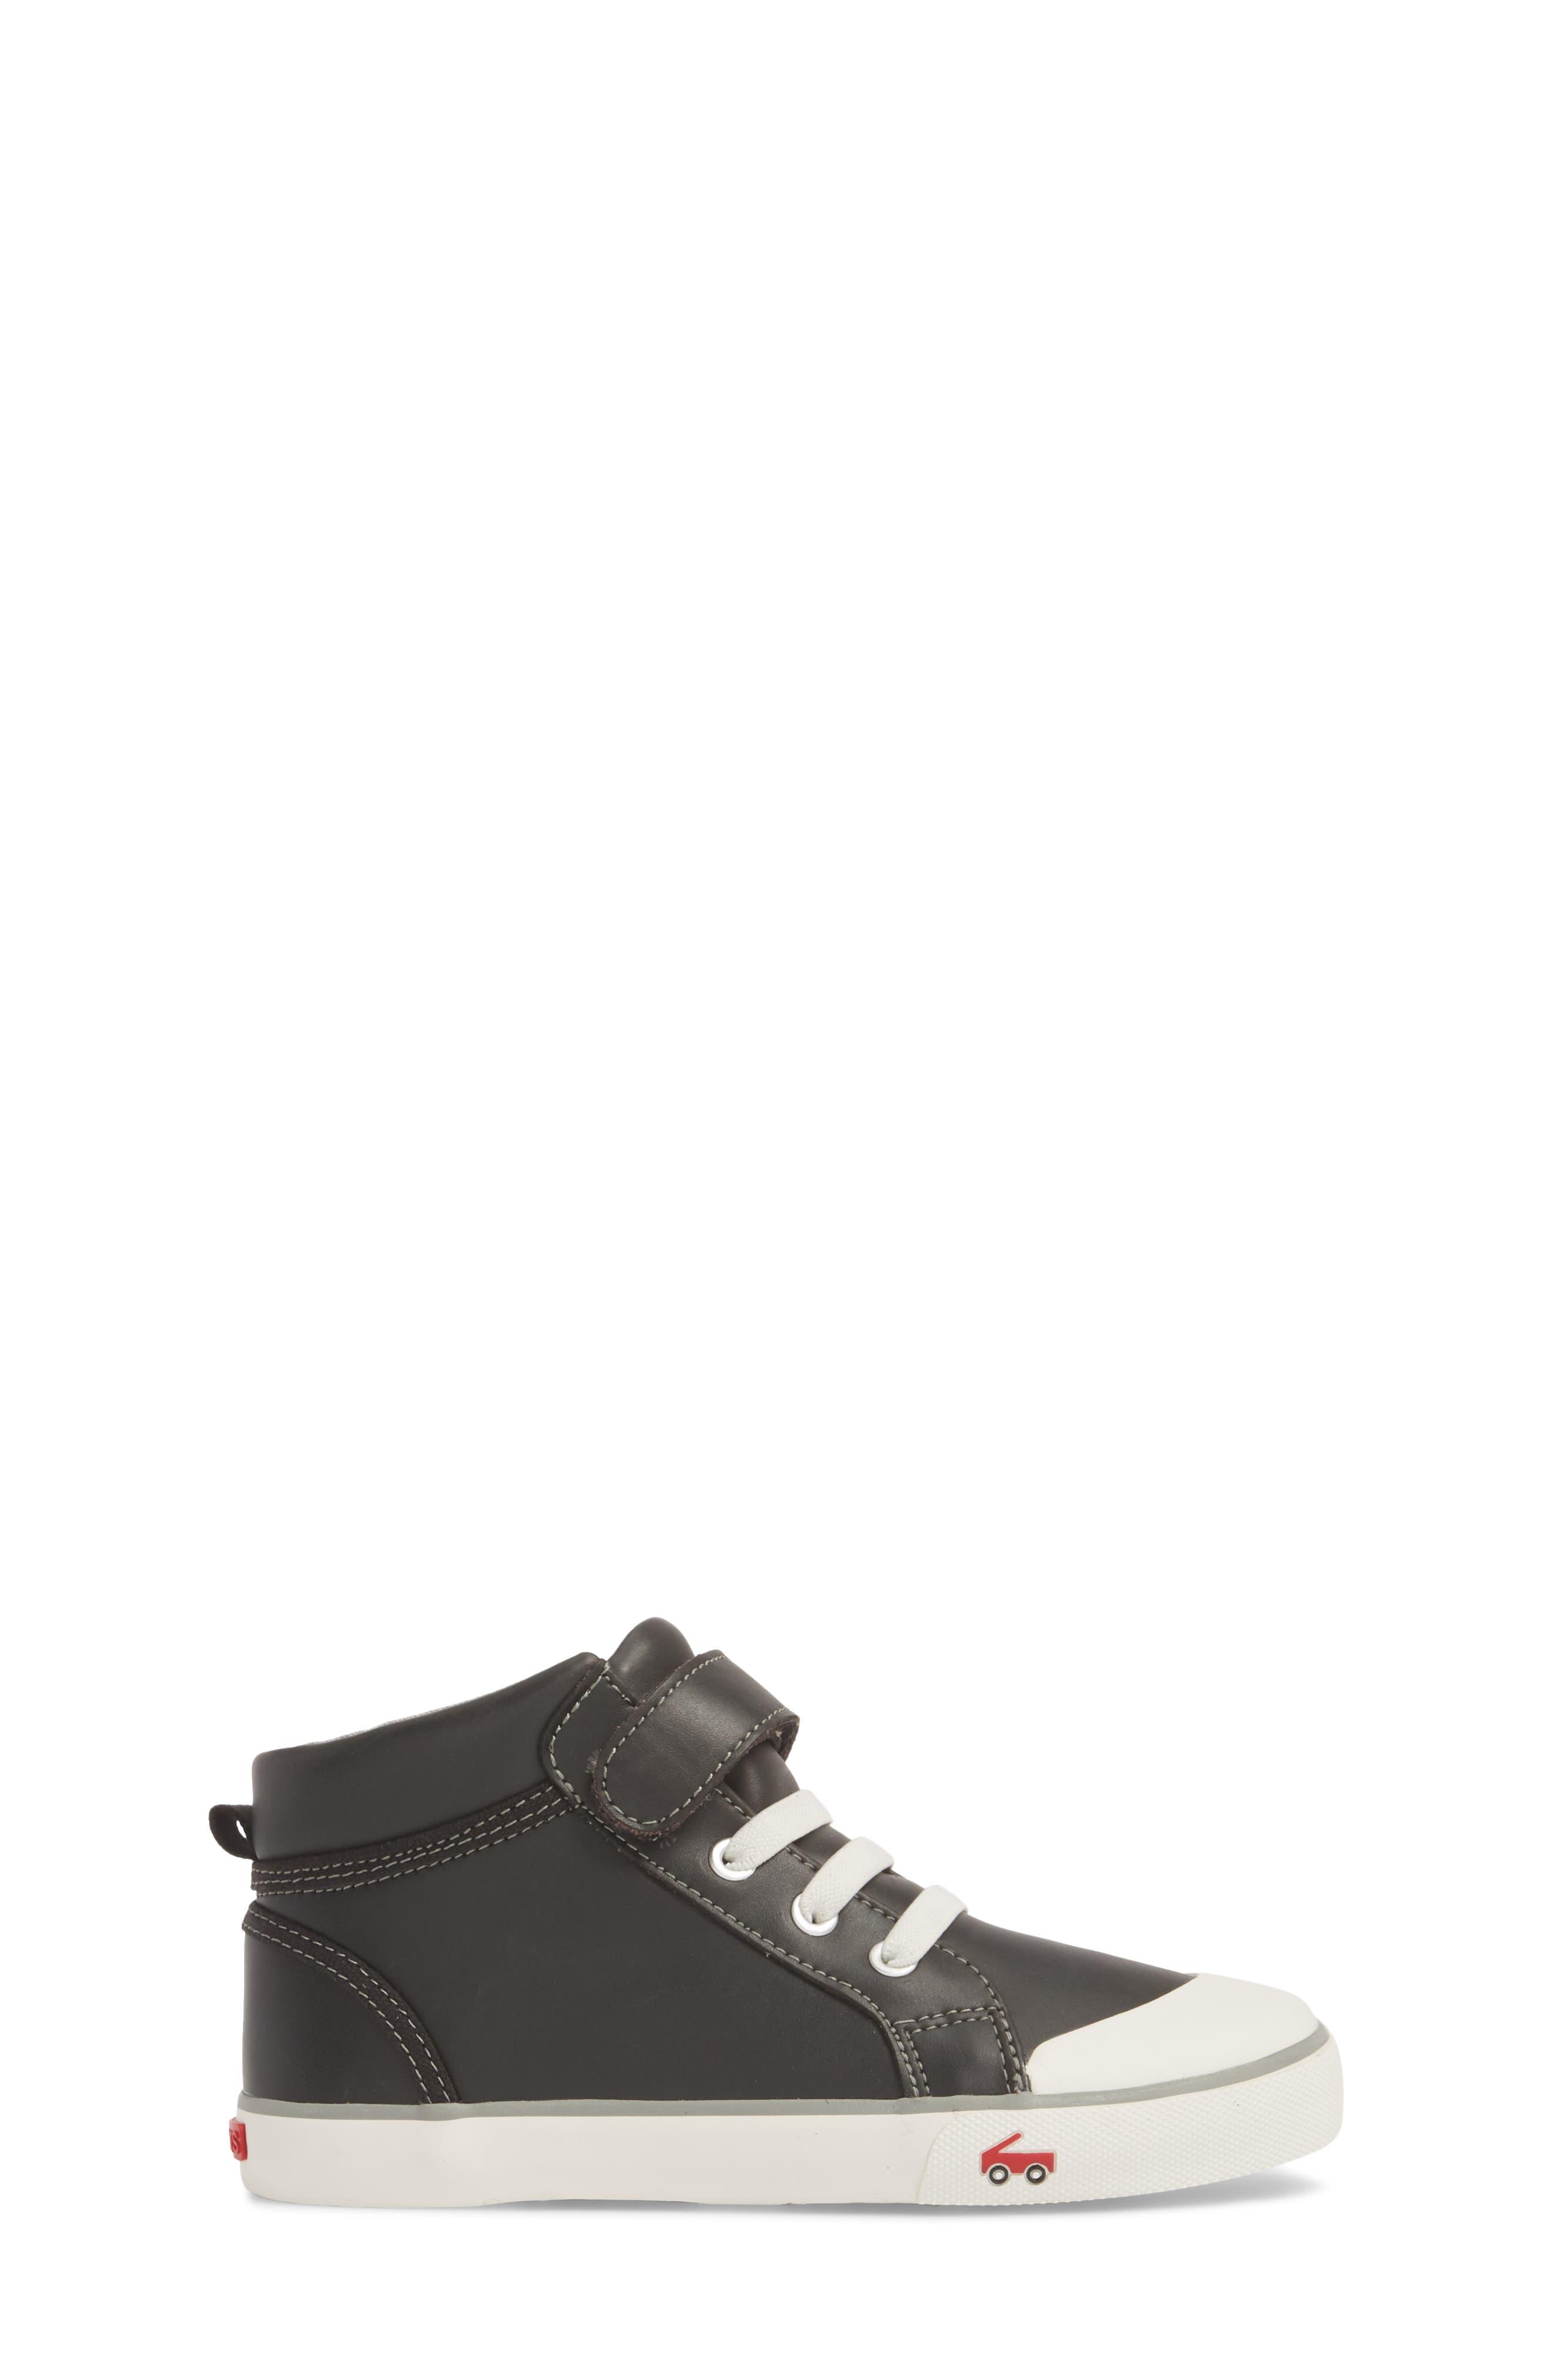 Peyton Metallic Mid Top Sneaker,                             Alternate thumbnail 4, color,                             Black Leather